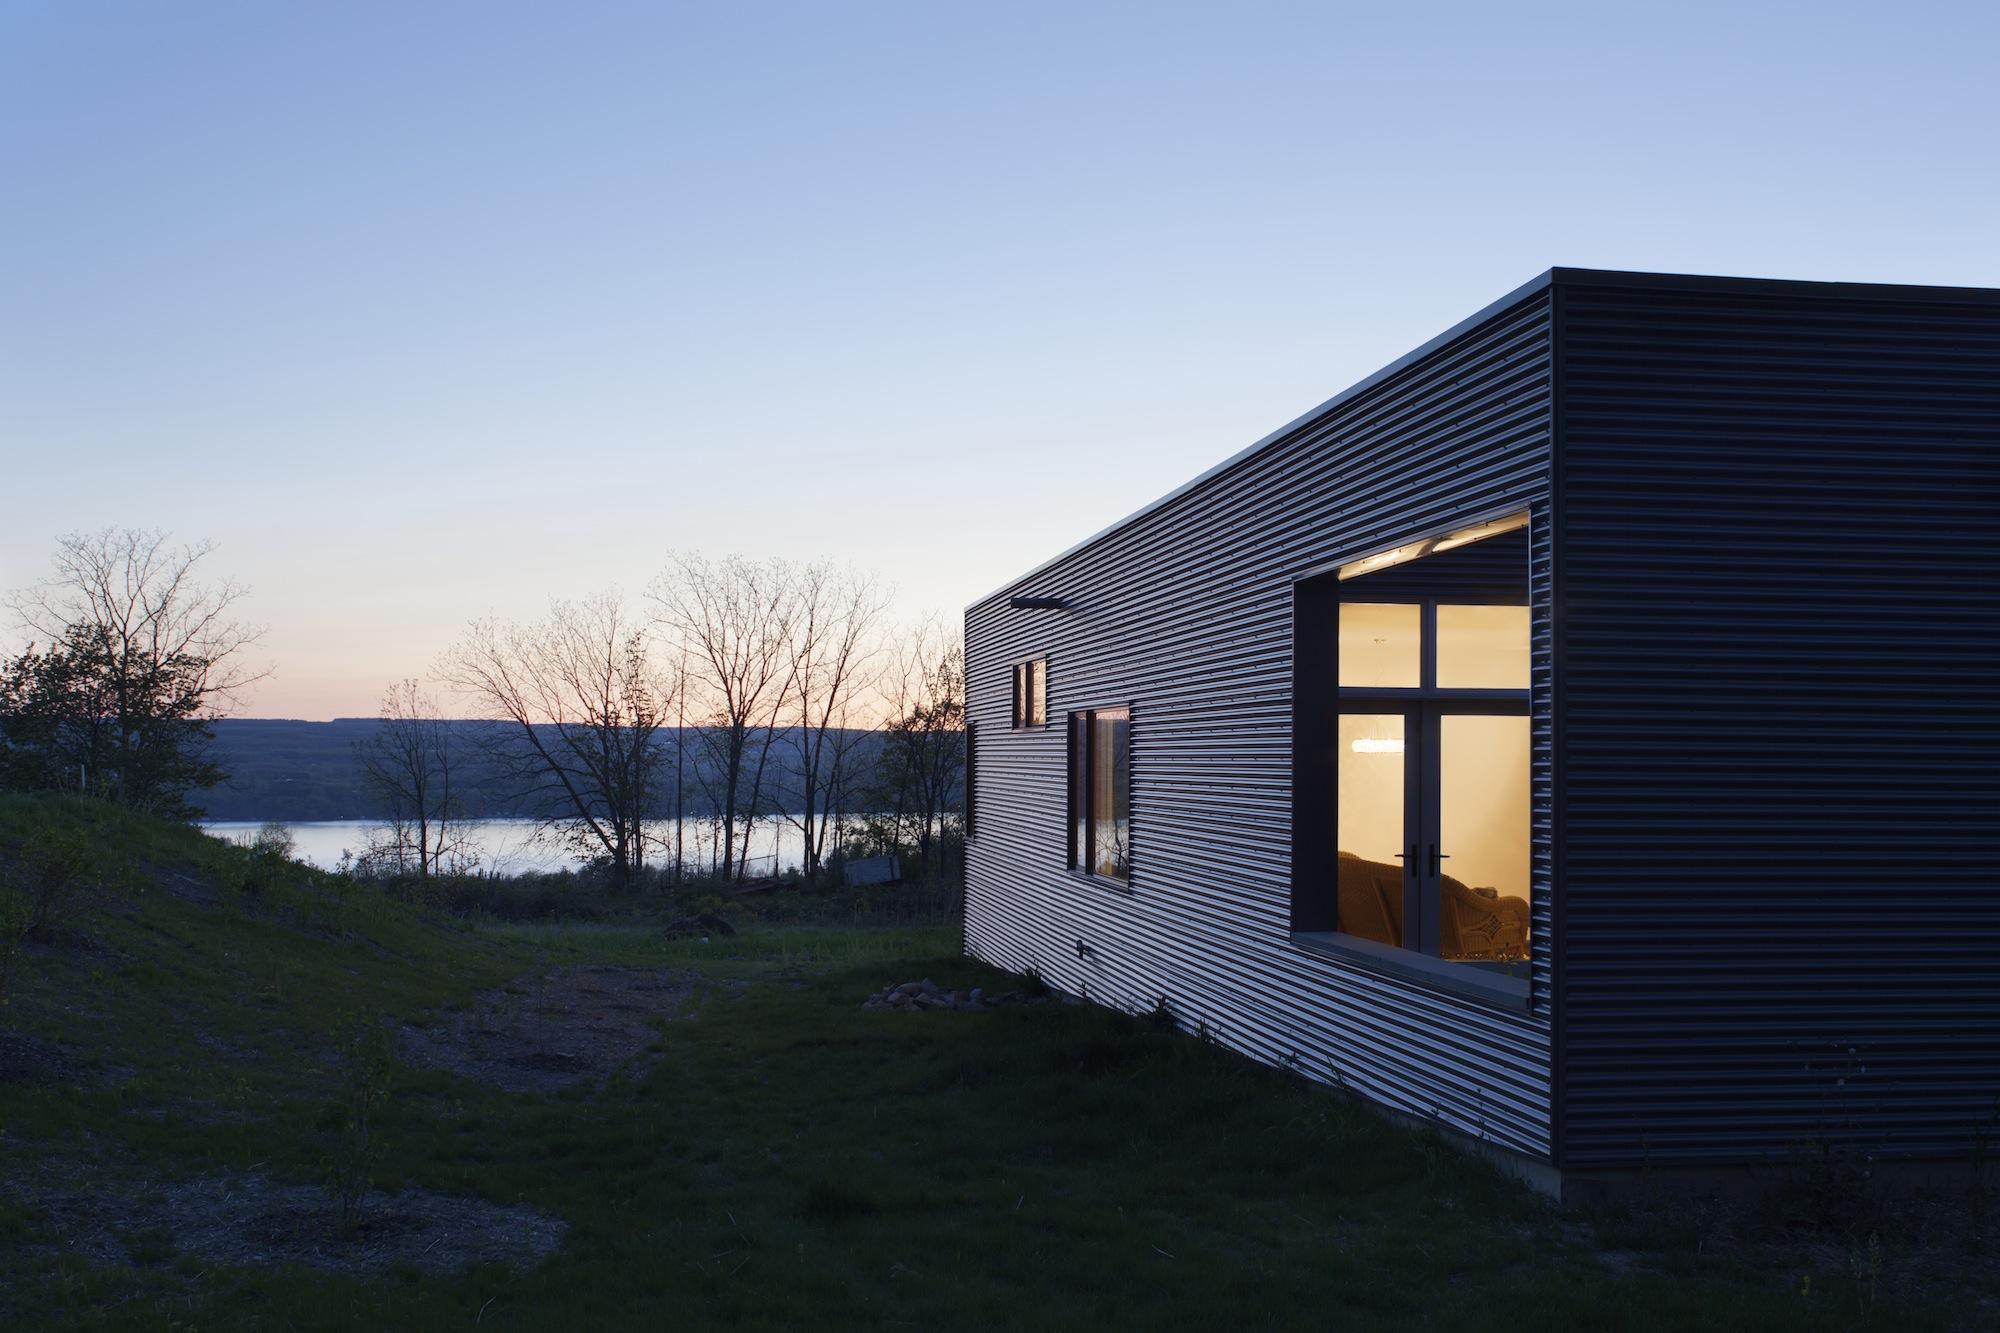 schickel-construction-barkowphoto-seneca-house.jpg